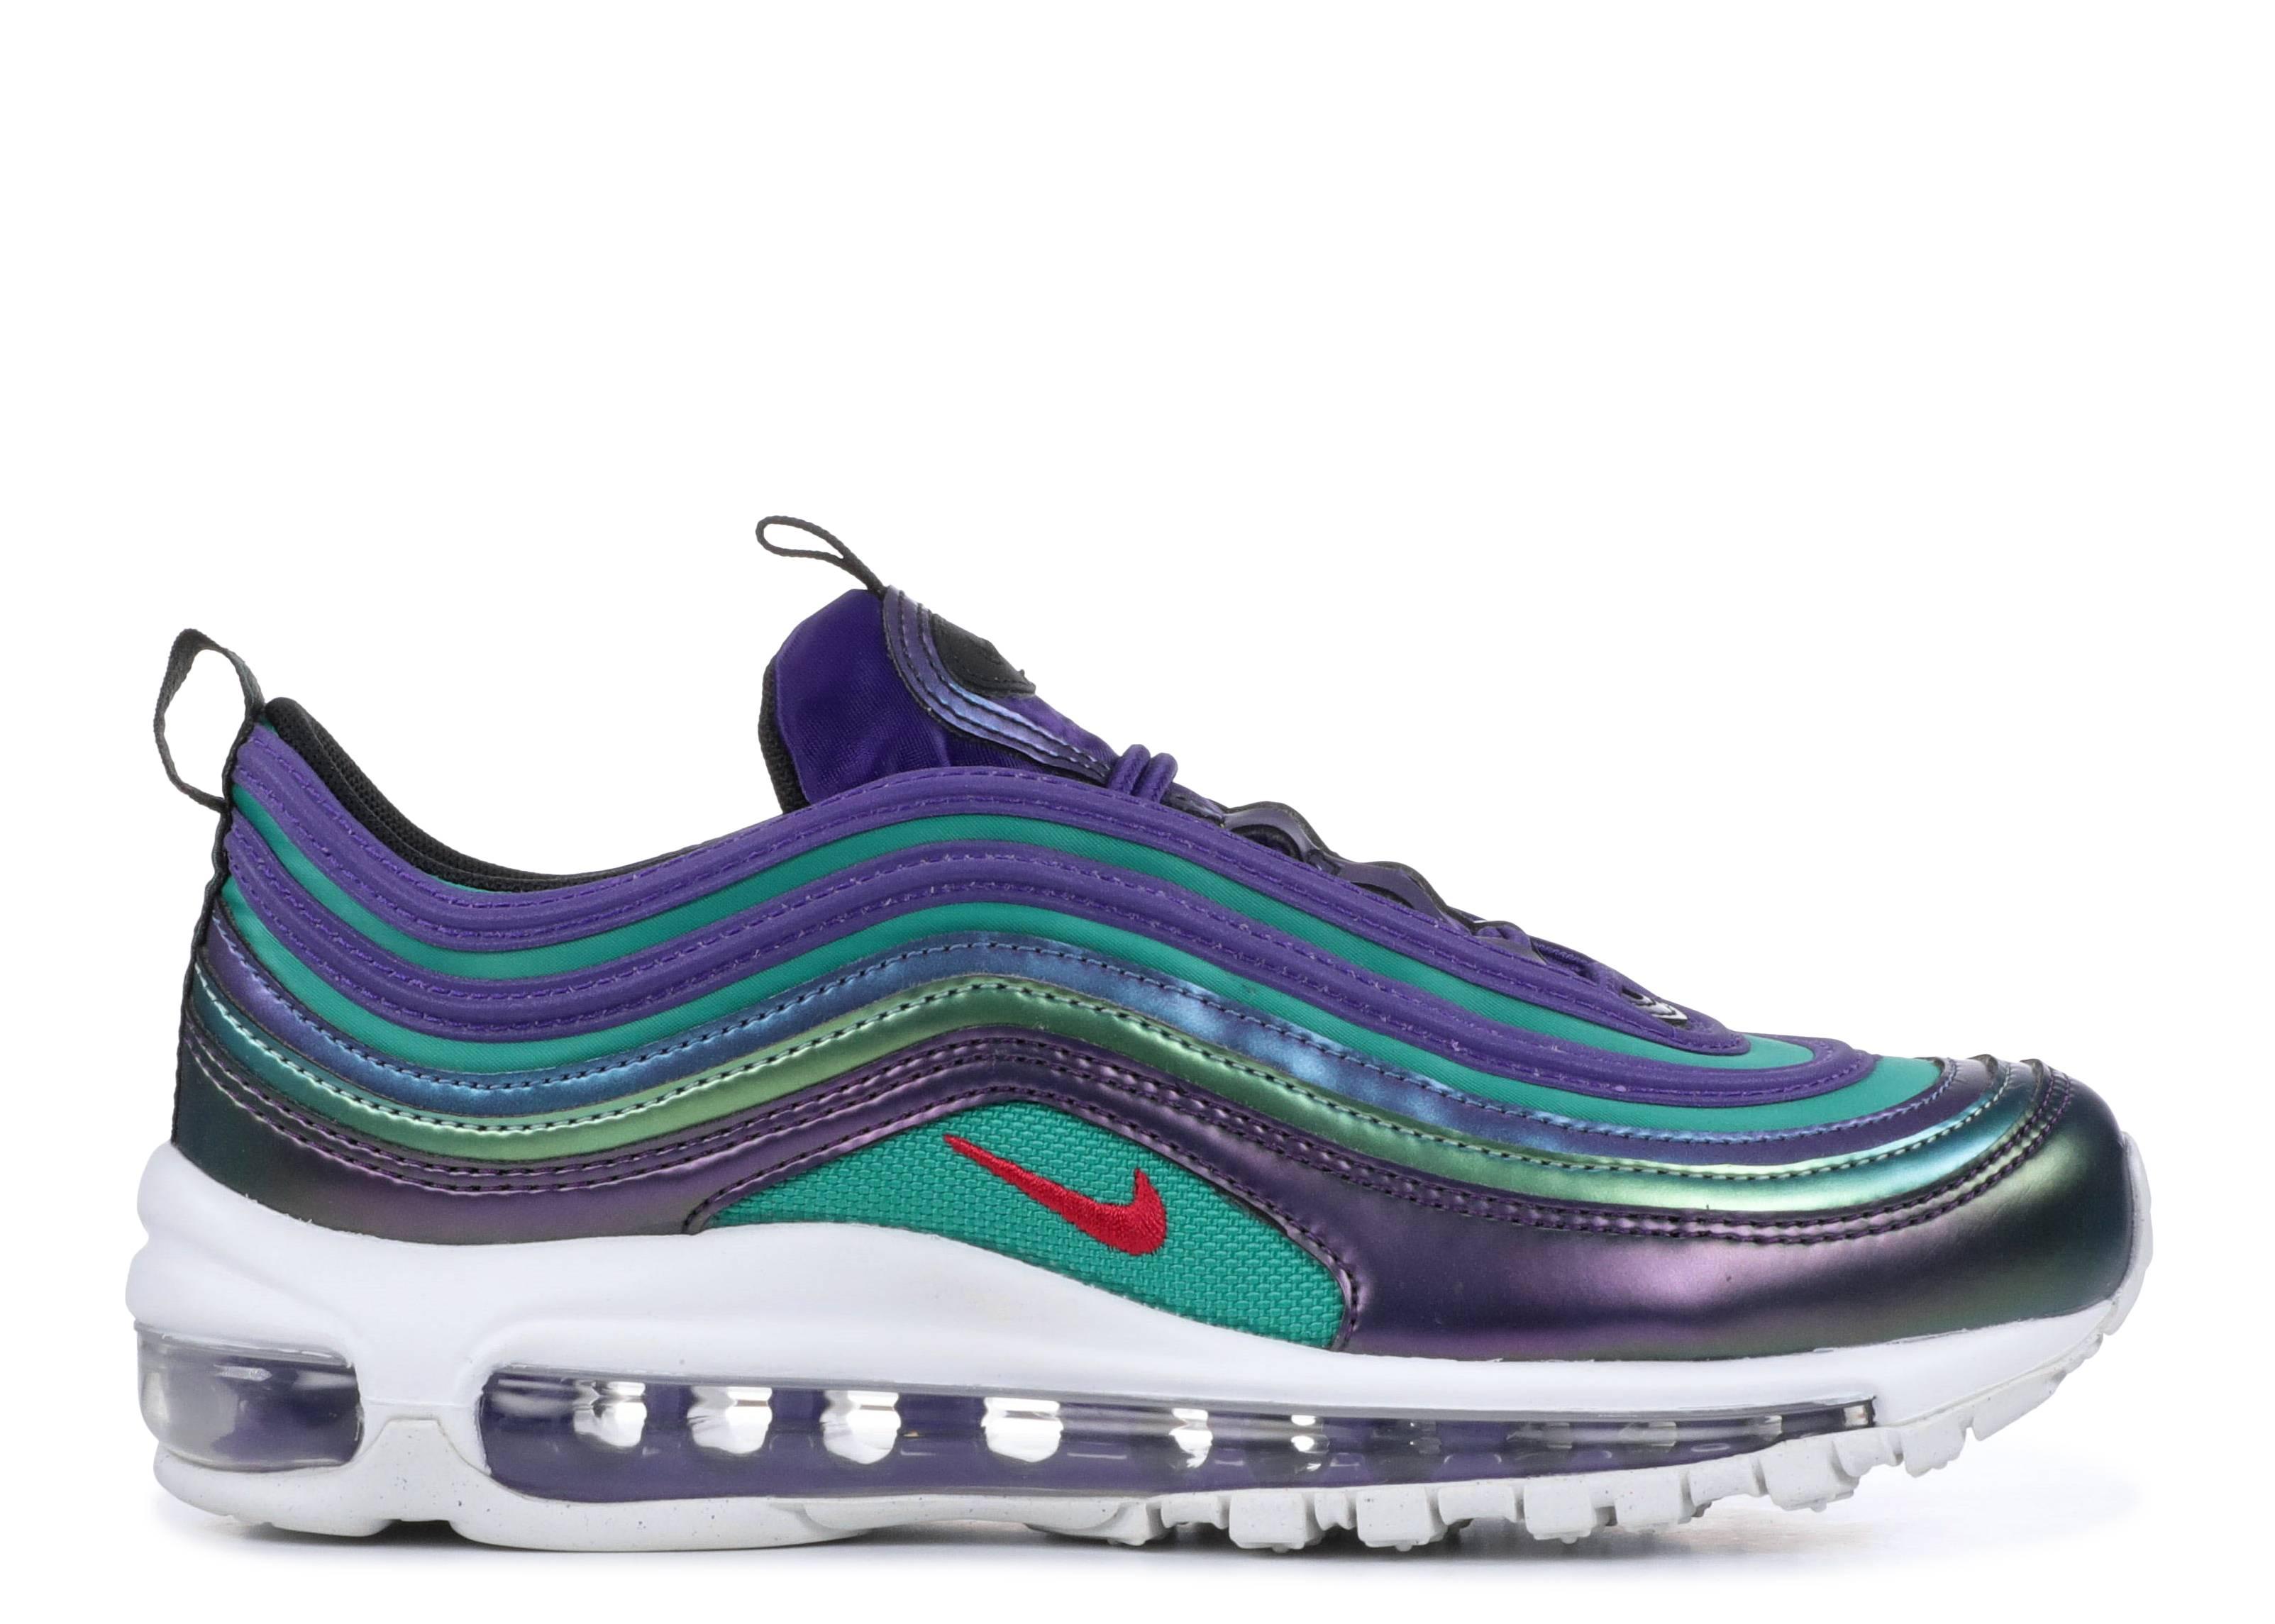 c23d895dc0737 Nike Air Max 97 Se (gs) - Nike - av3181 500 - court purple rush pink ...